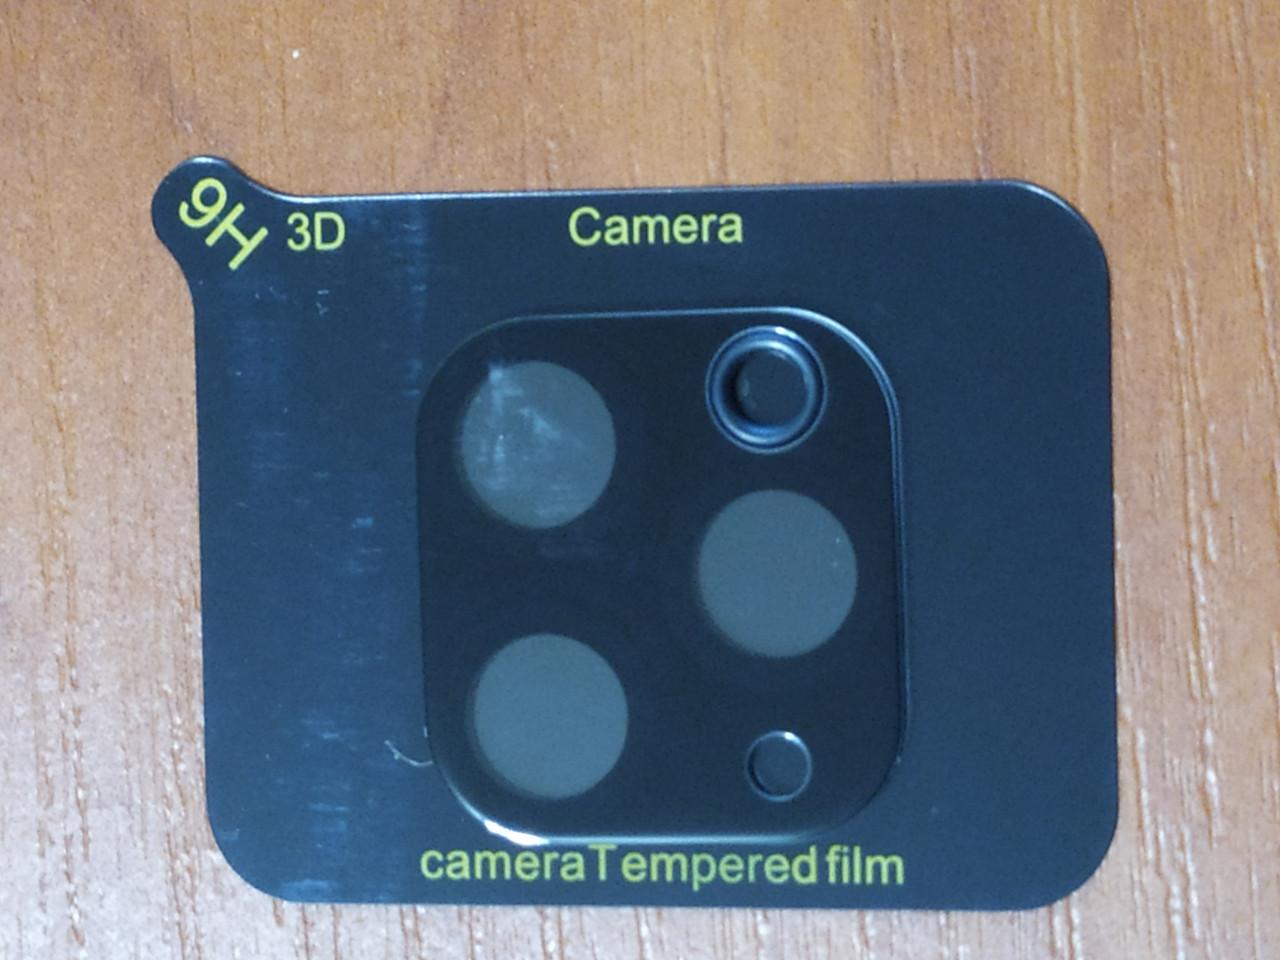 Скло на камеру Camera Tempered Glass 3D / 9H iPhone 11 Pro 2019 (чорне)